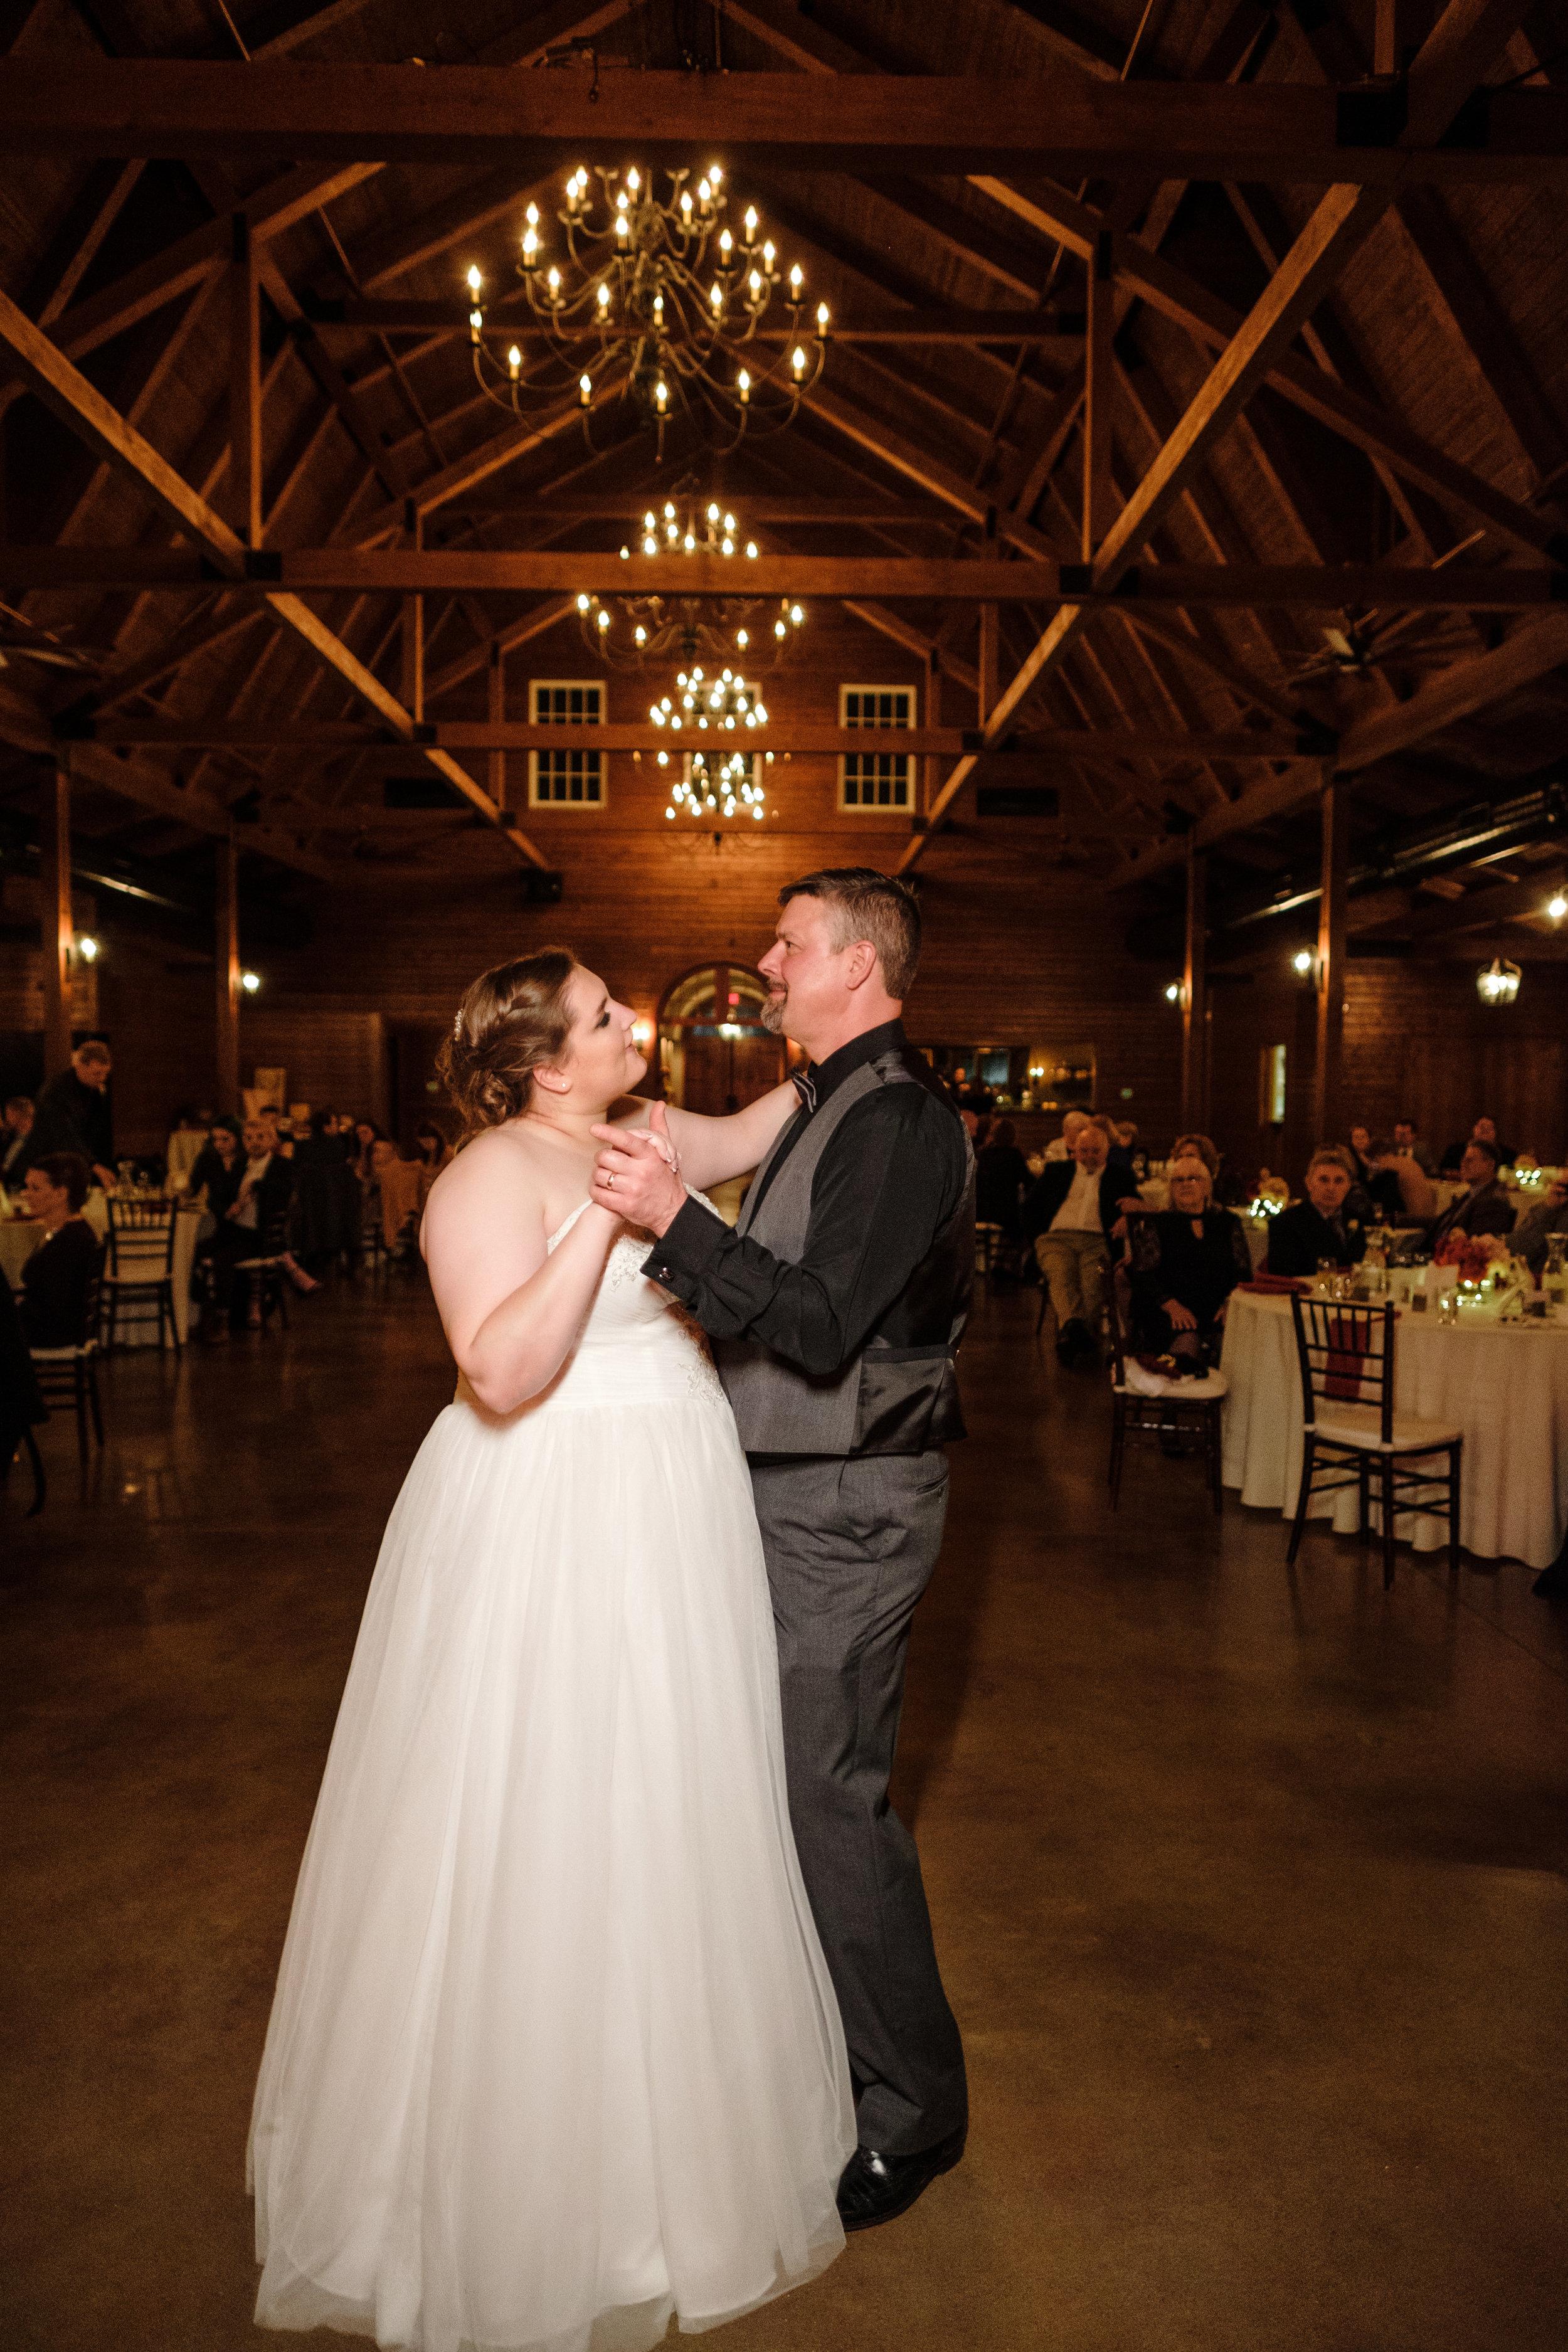 18-12-28 Corinne-Henry-Pavilion-Wedding-556.jpg